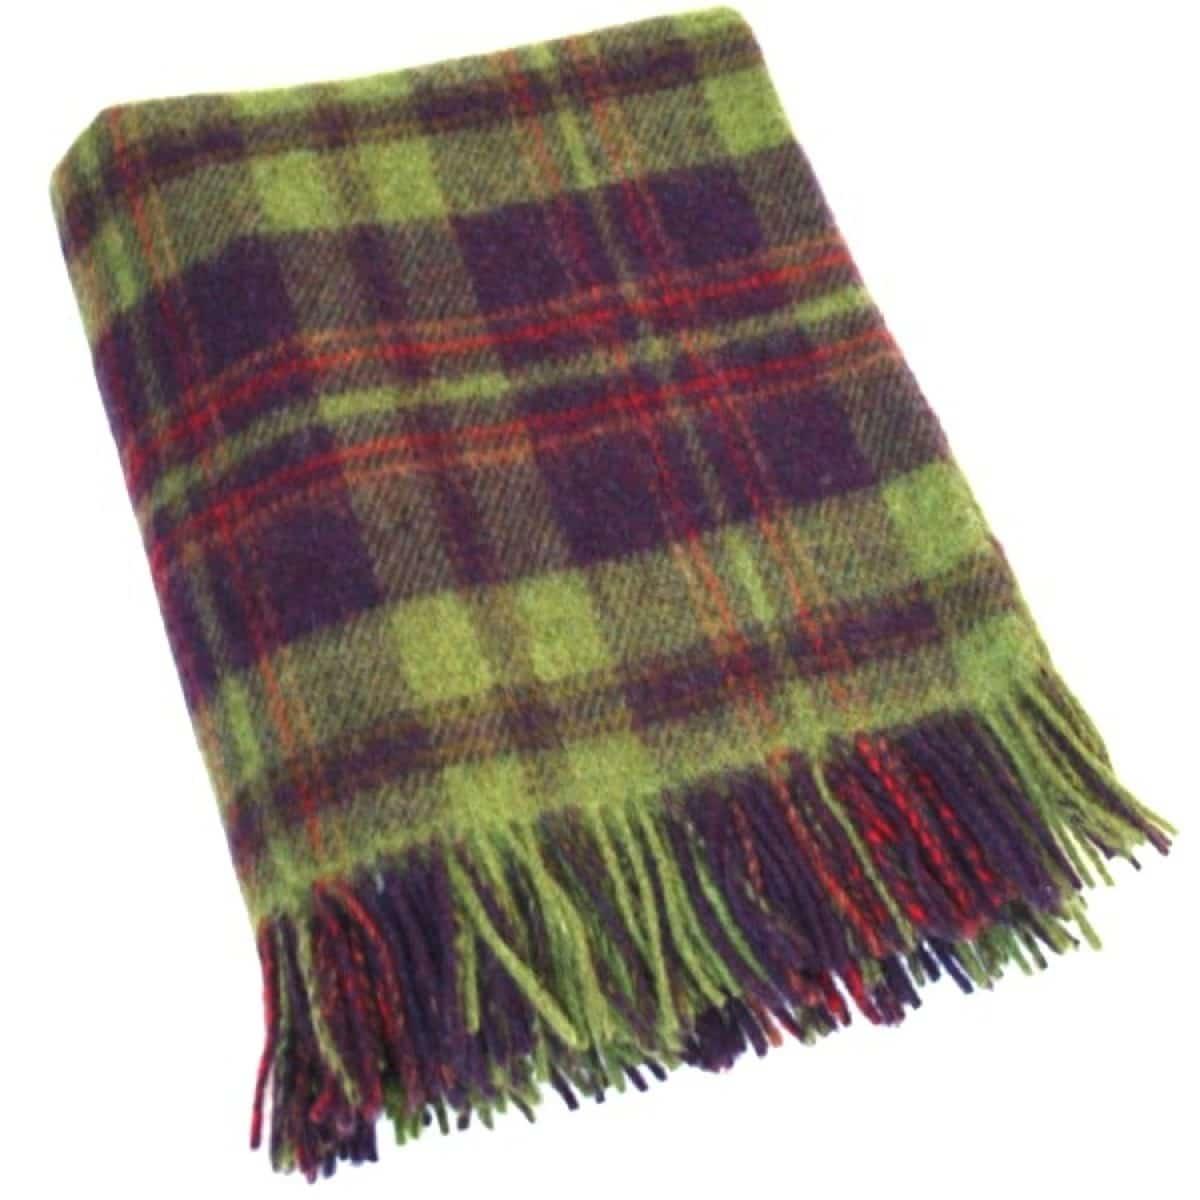 Wool Blanket - Cucumber Days